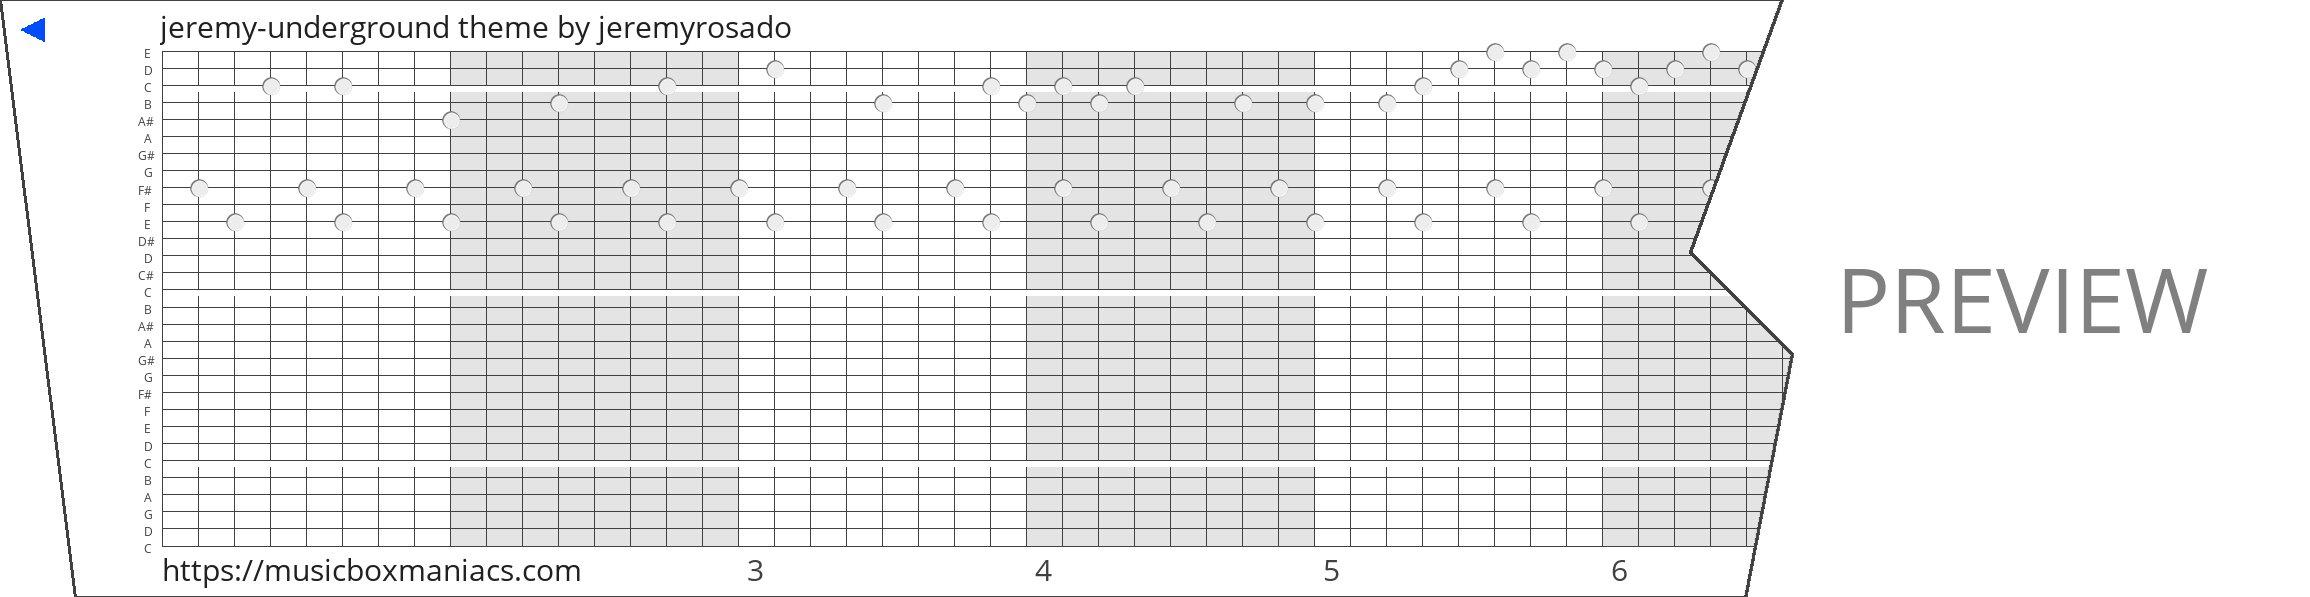 jeremy-underground theme 30 note music box paper strip